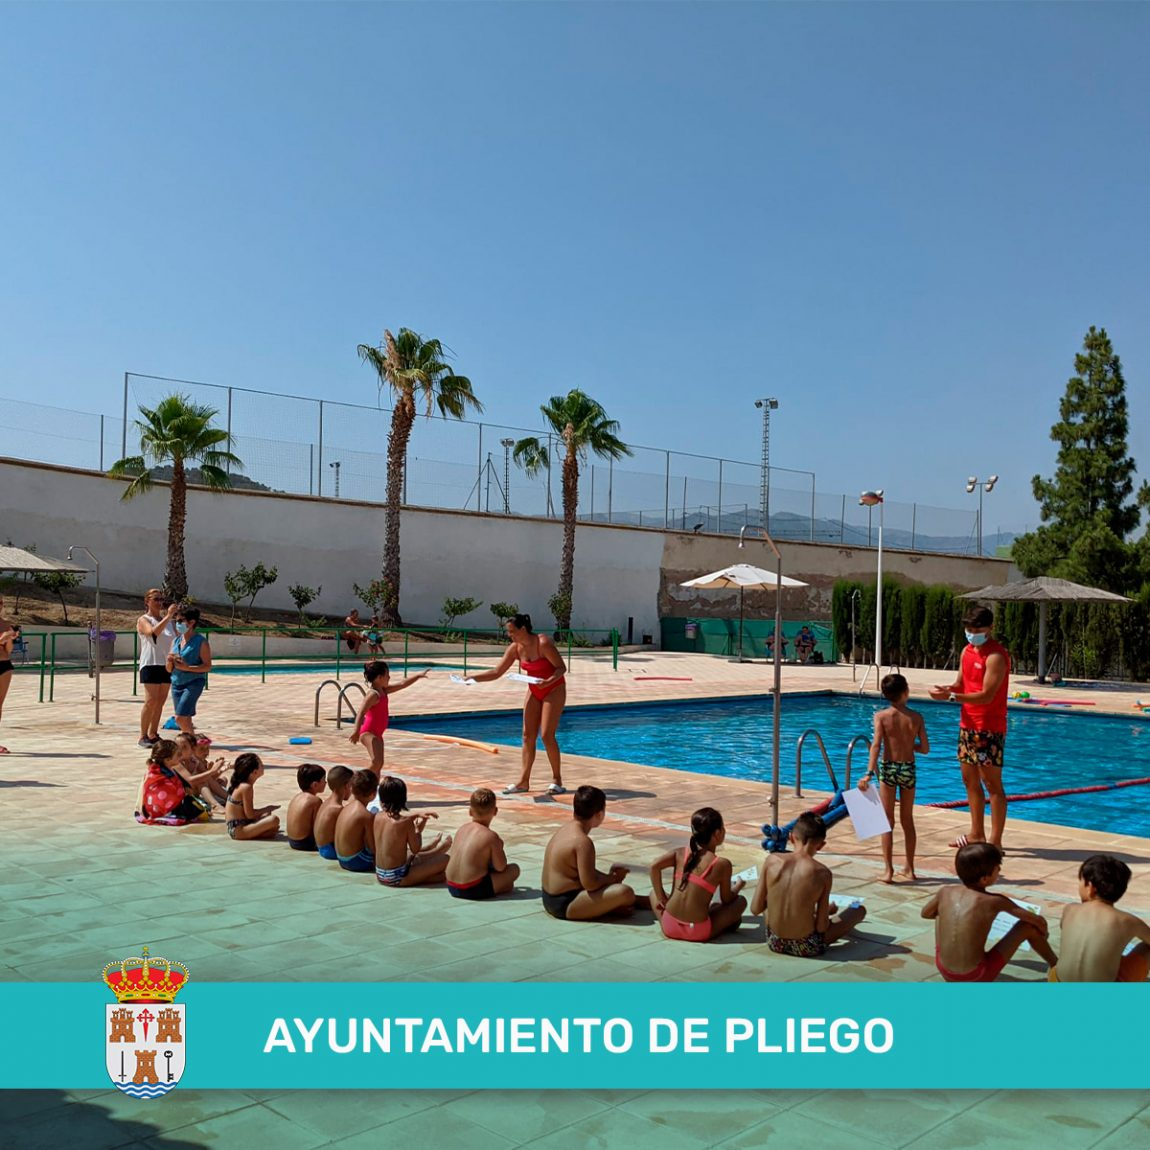 Entrega de diplomas de participación al primer turno de clases de natación